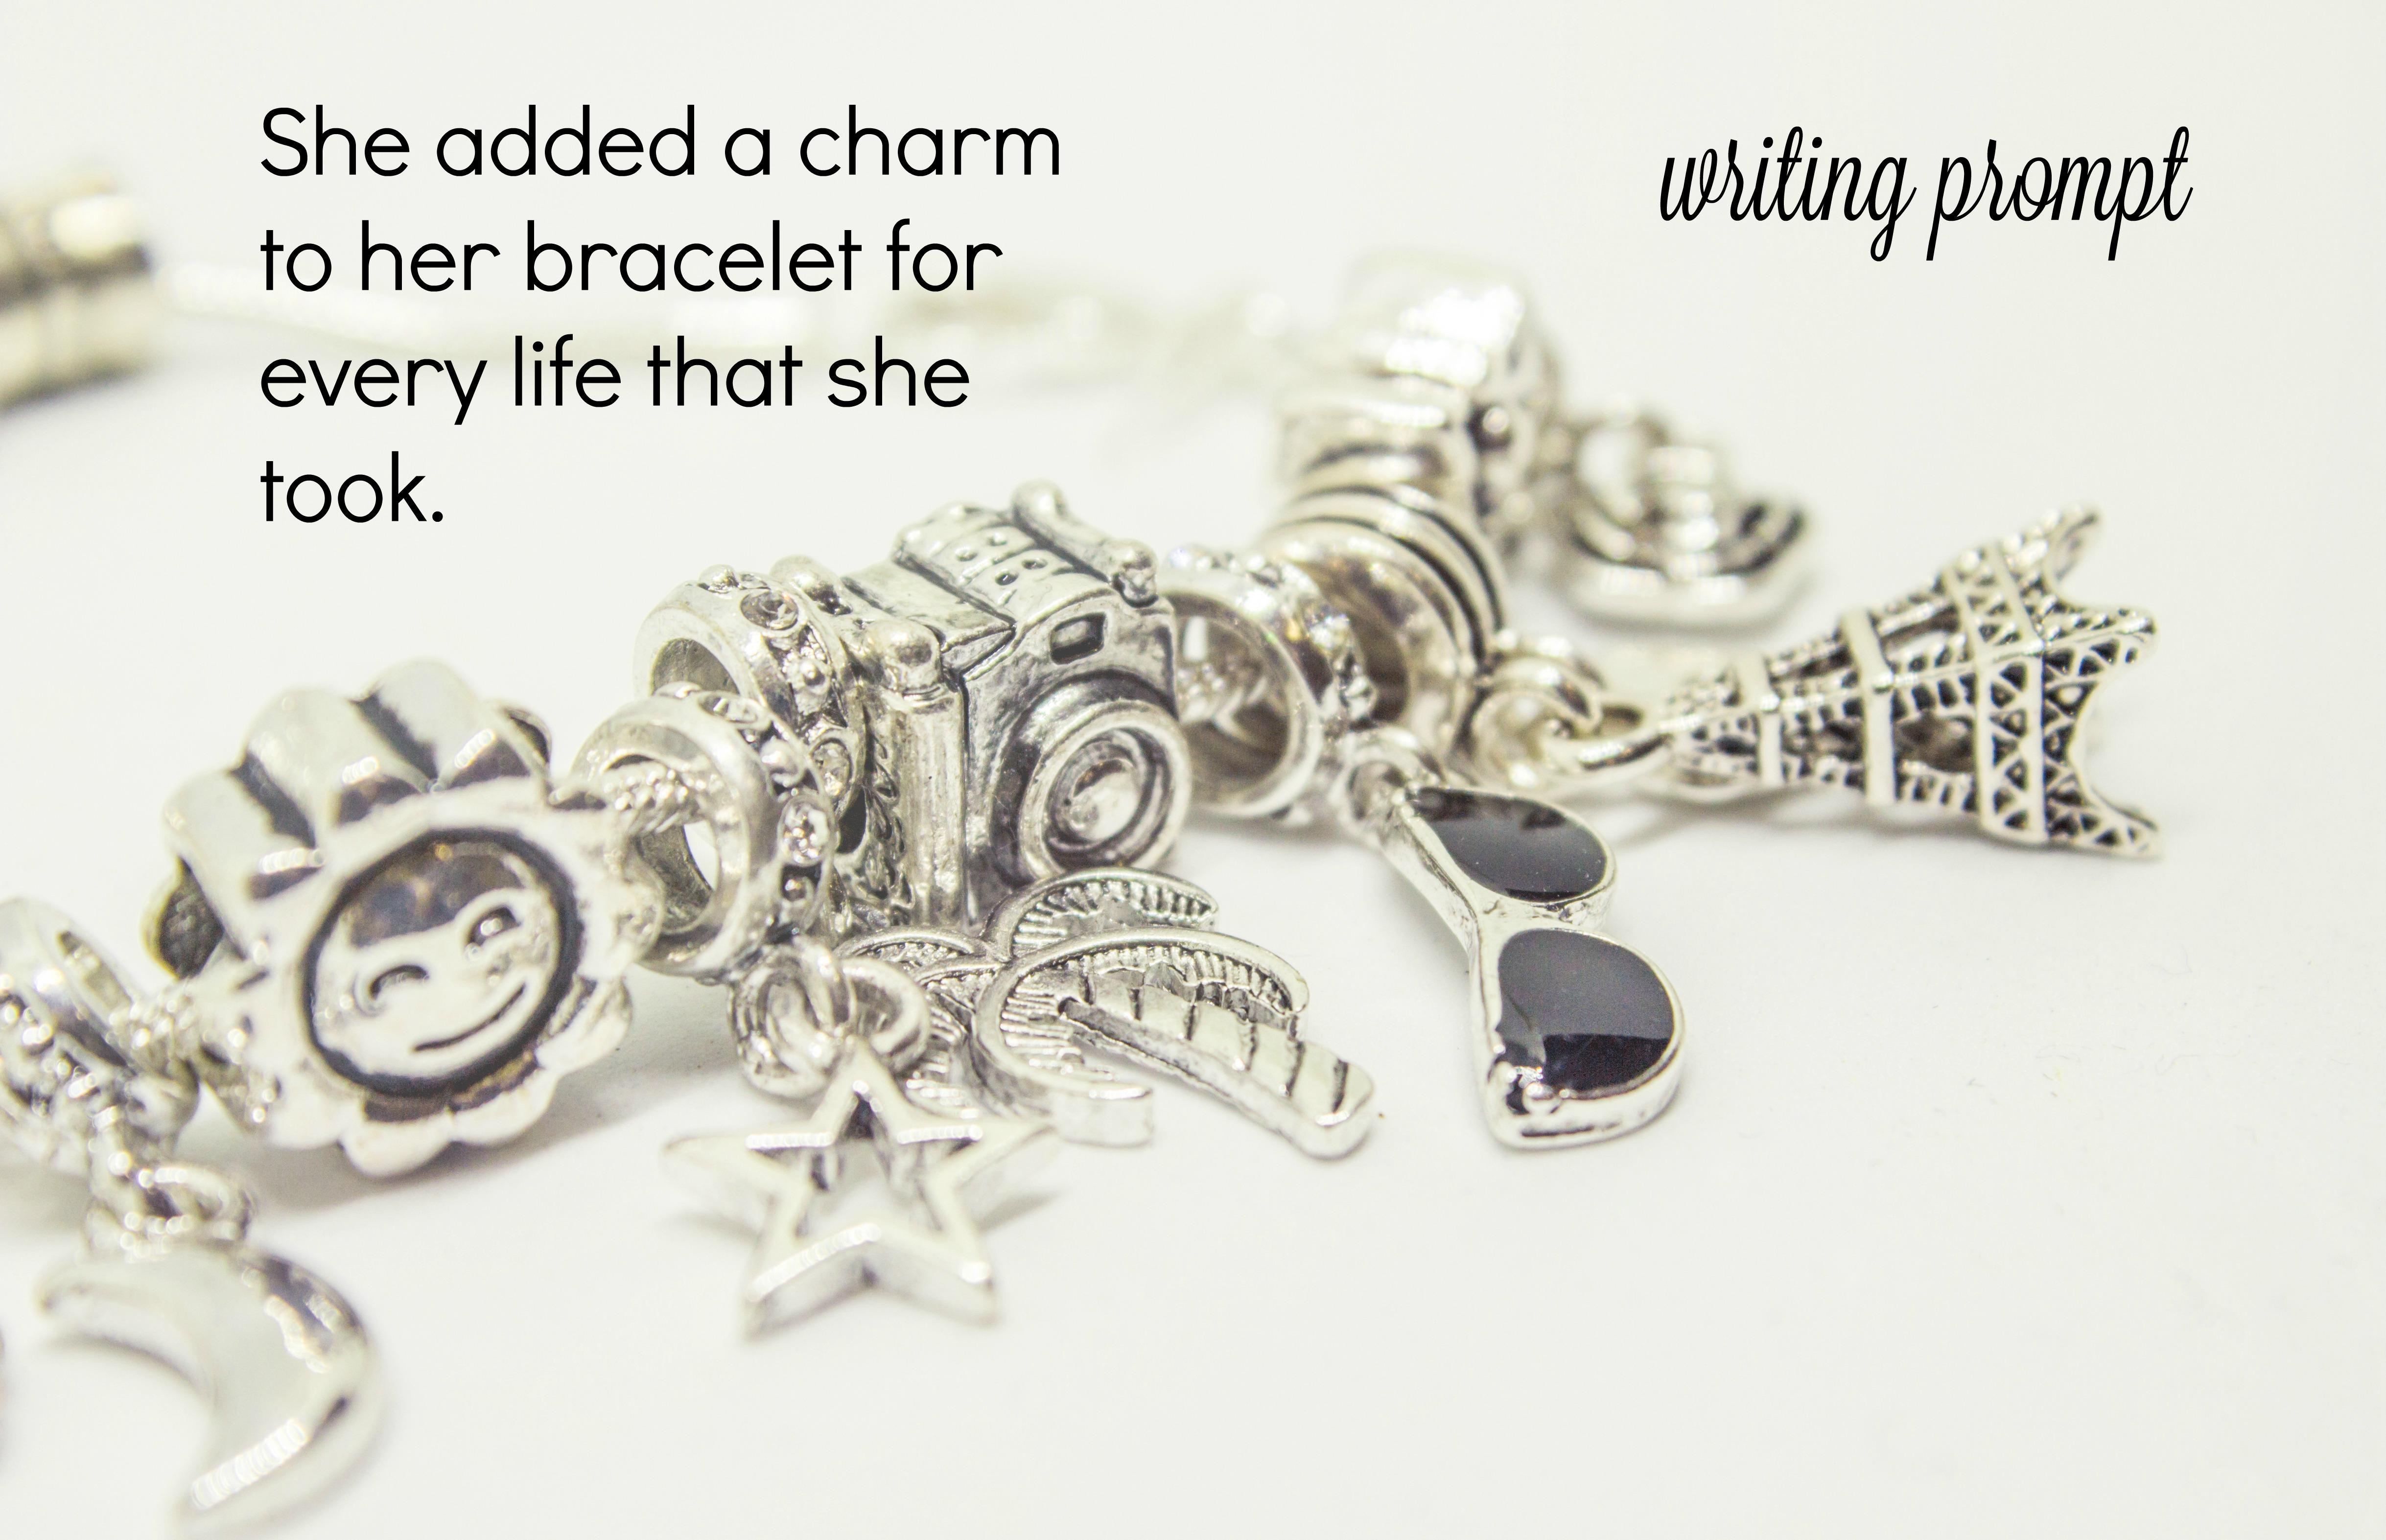 ugc-charm-bracelet-prompt-1